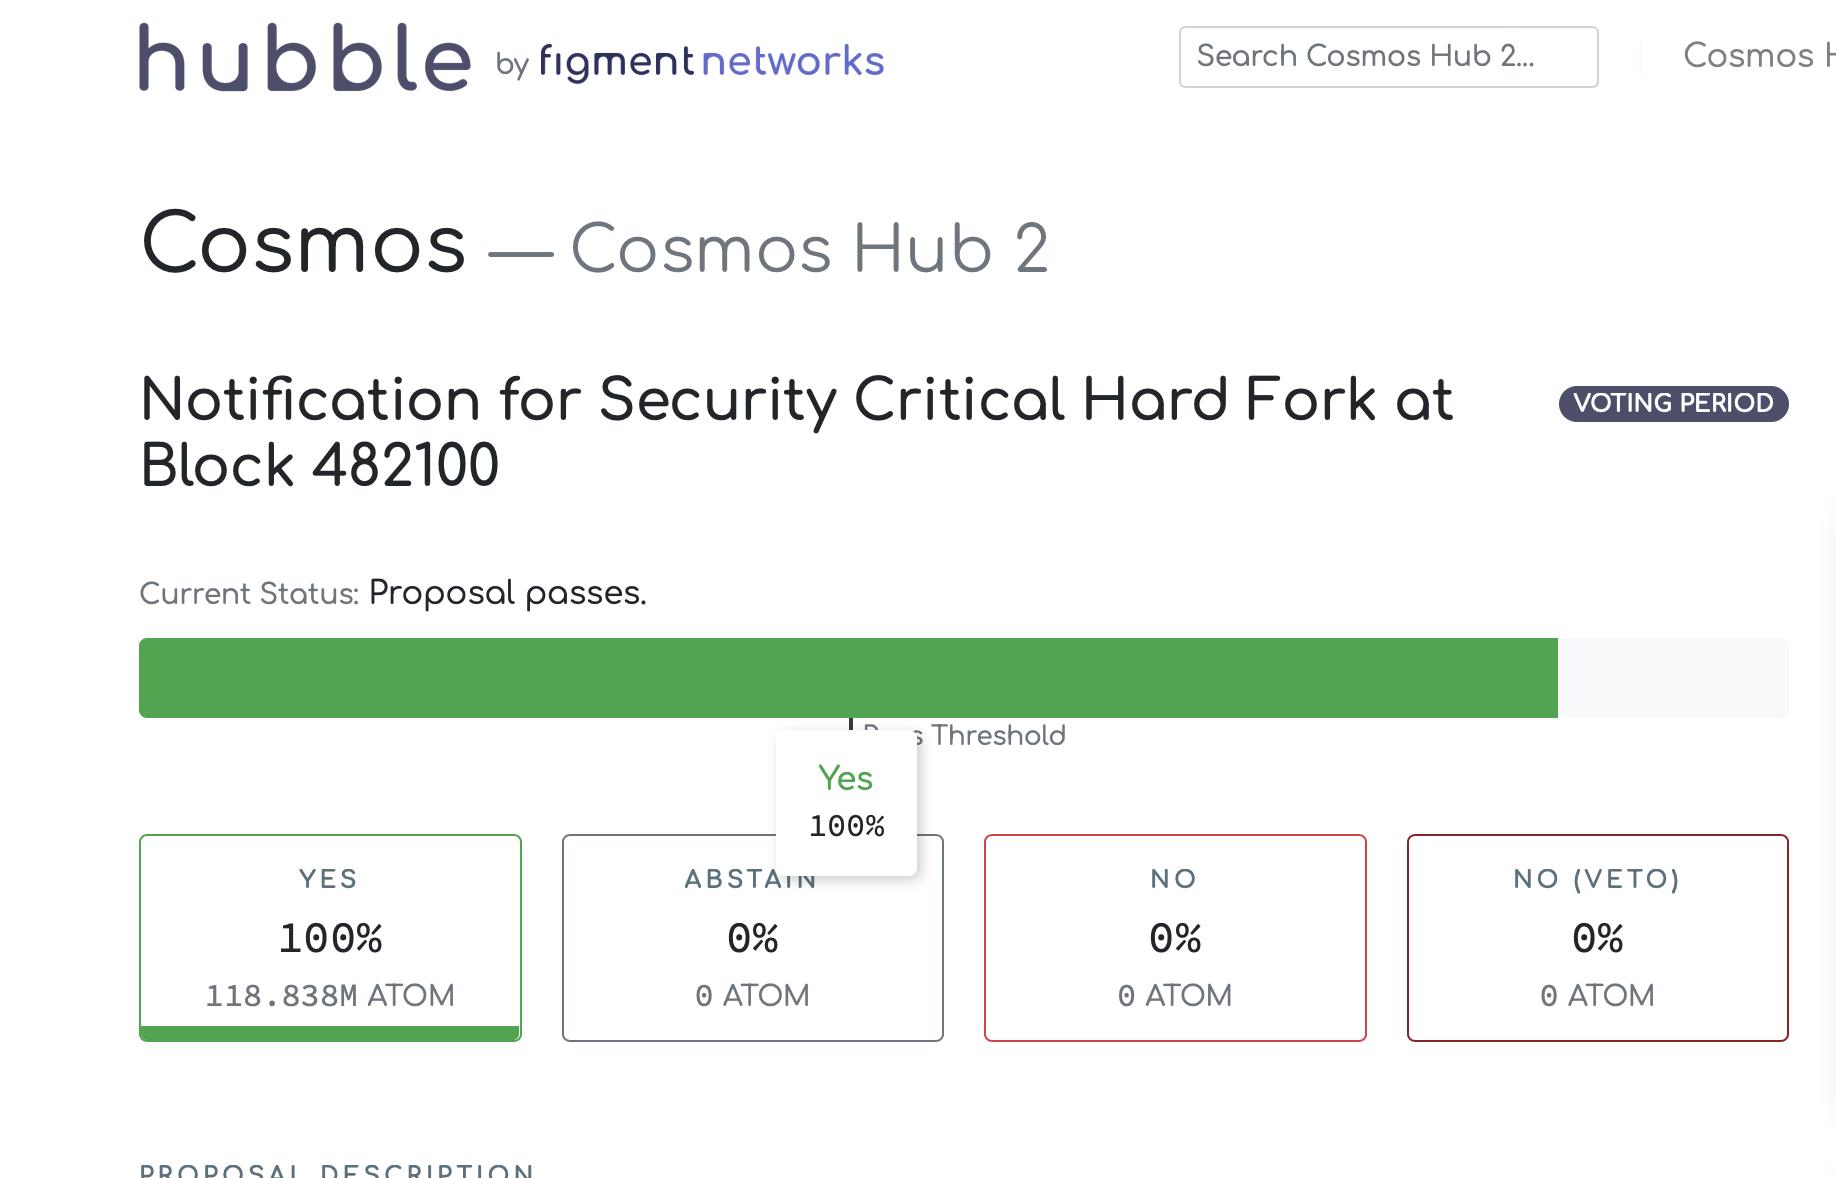 Cosmos曝出高危漏洞,将在区块高度482100进行硬分叉升级